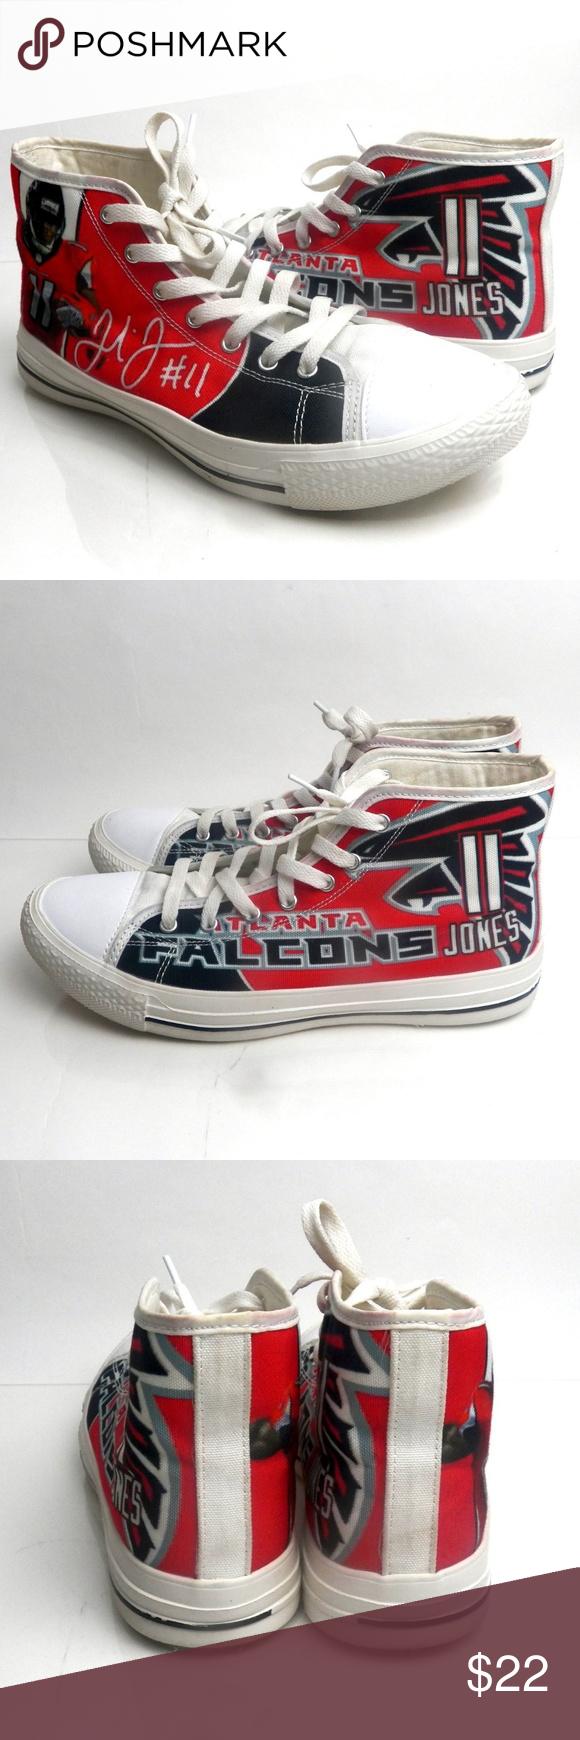 Atlanta Falcons Julio Jones Canvas Shoes Canvas Shoes Atlanta Falcons Shoes